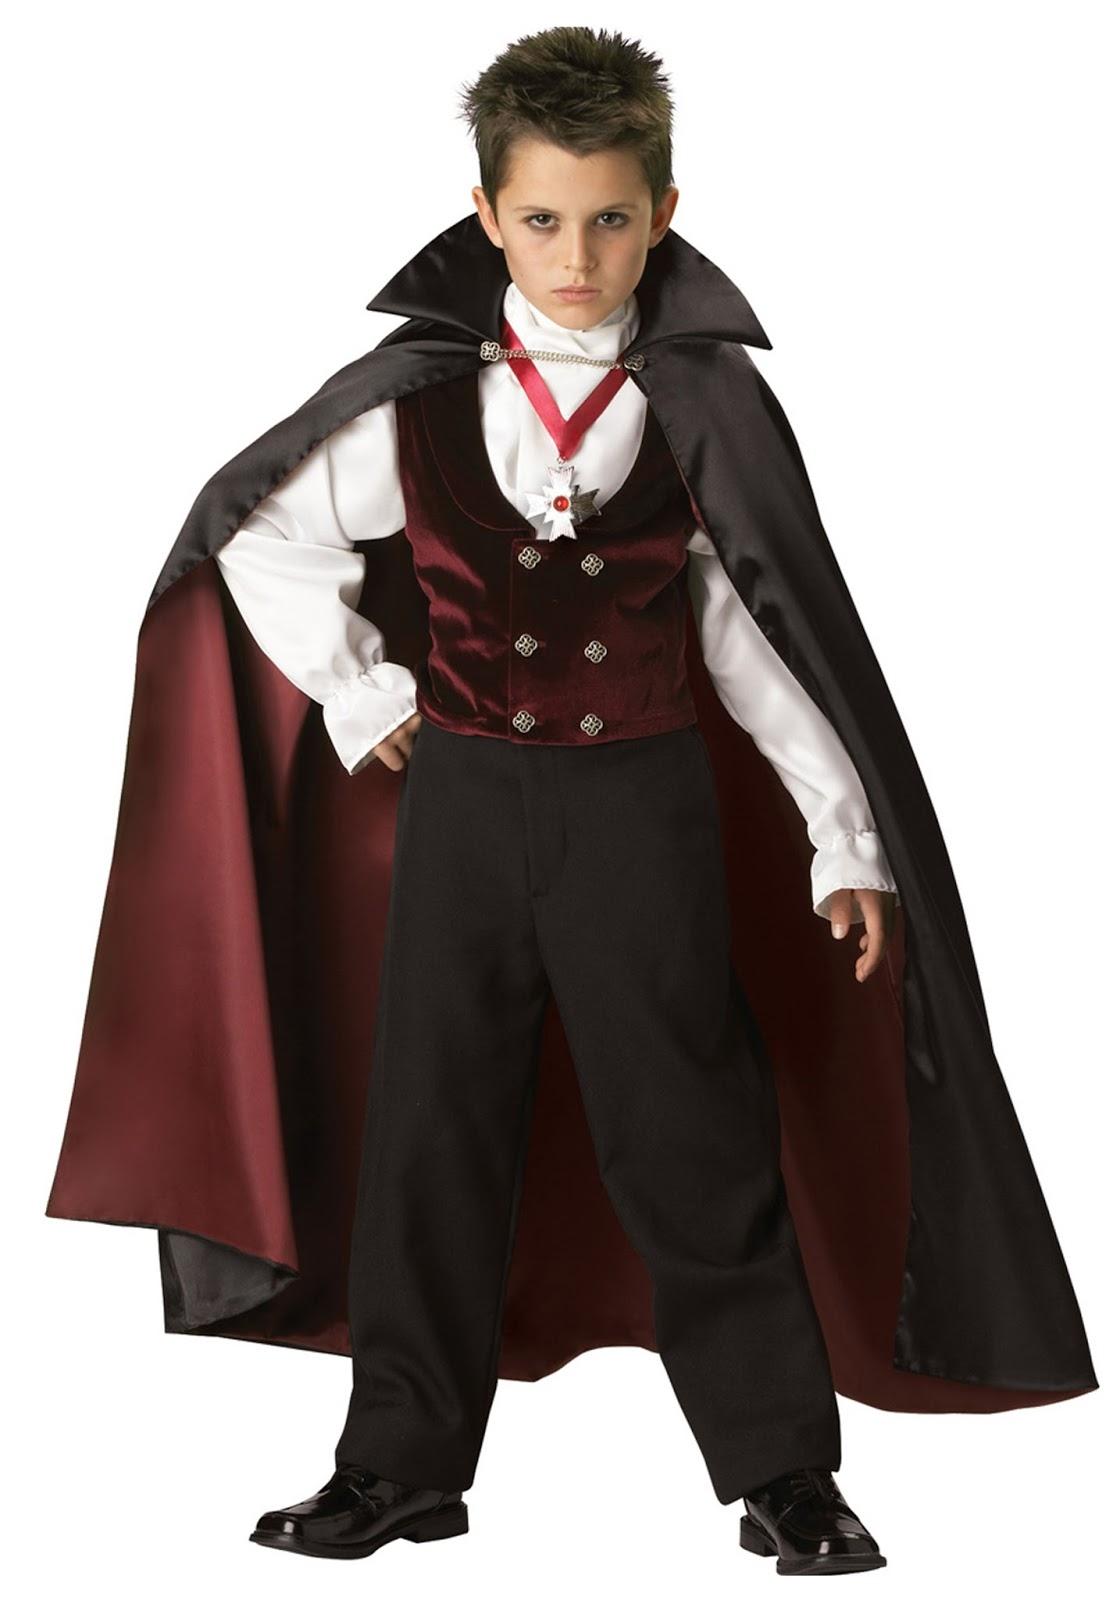 50+ Good Halloween Costumes for Kids - Halloween Costumes Ideas ...